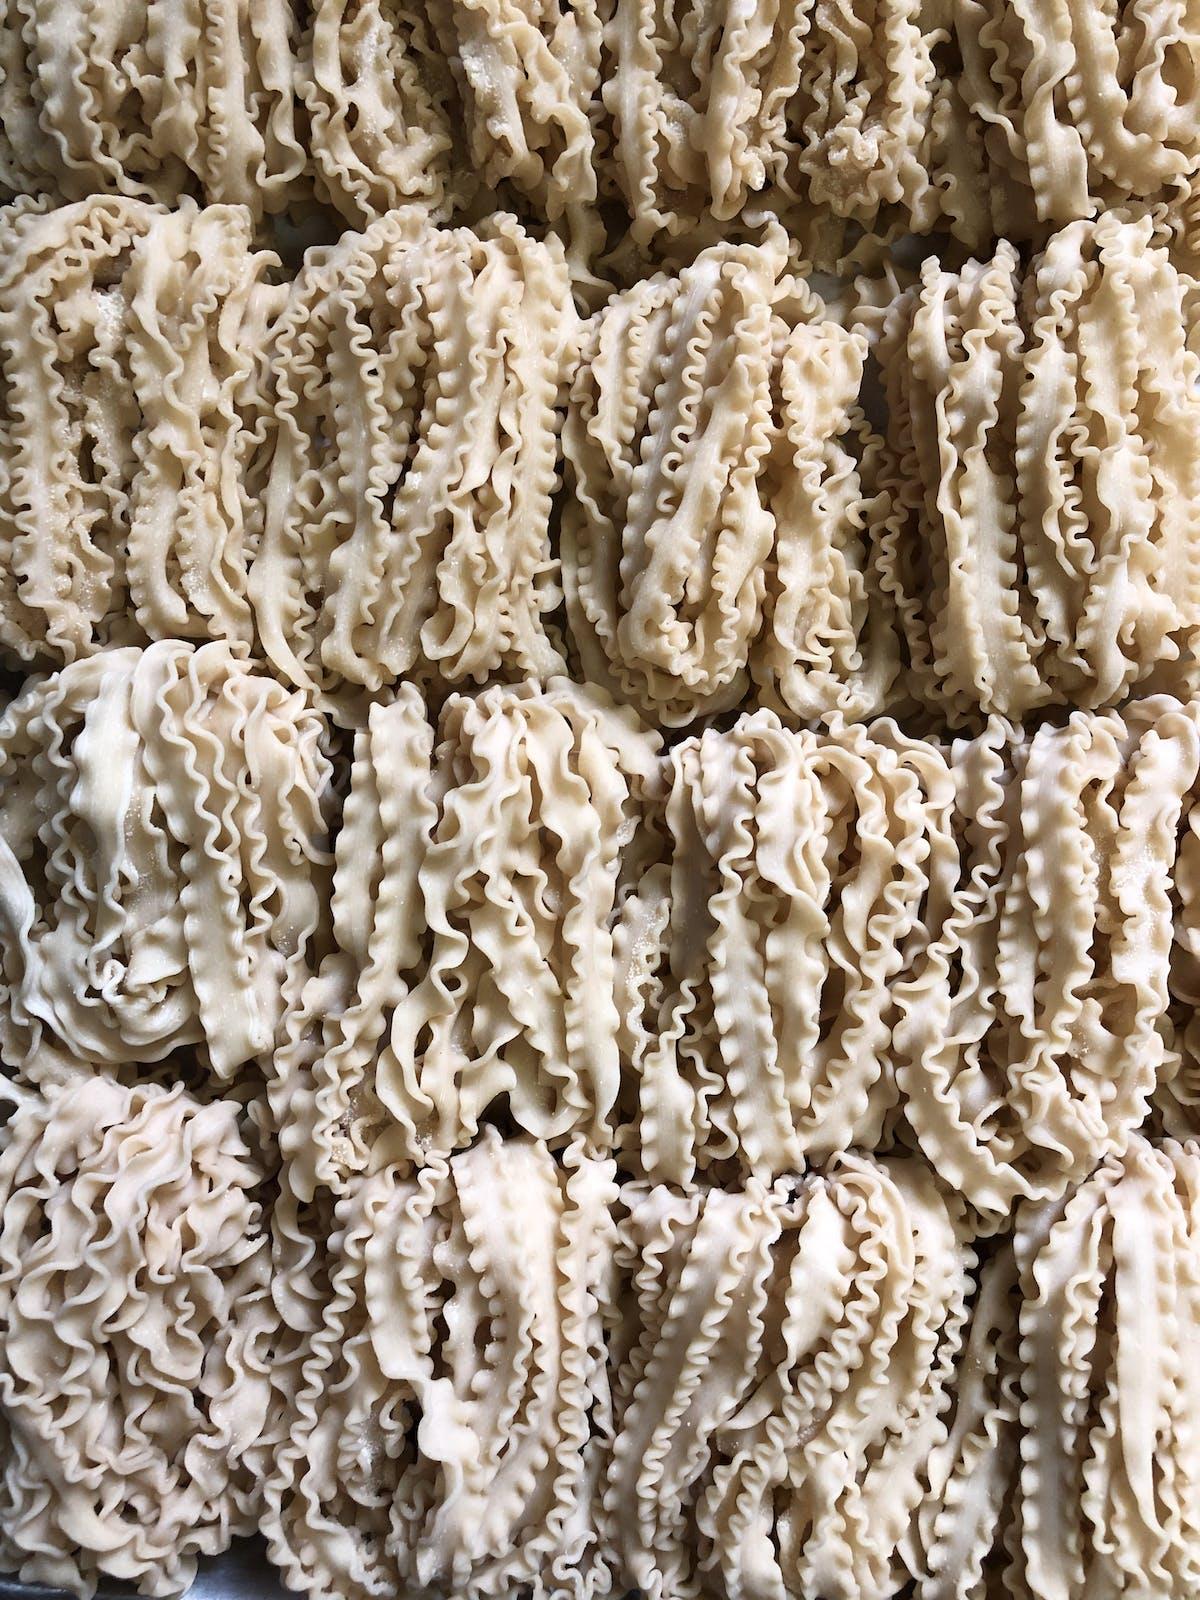 a close up of a pasta